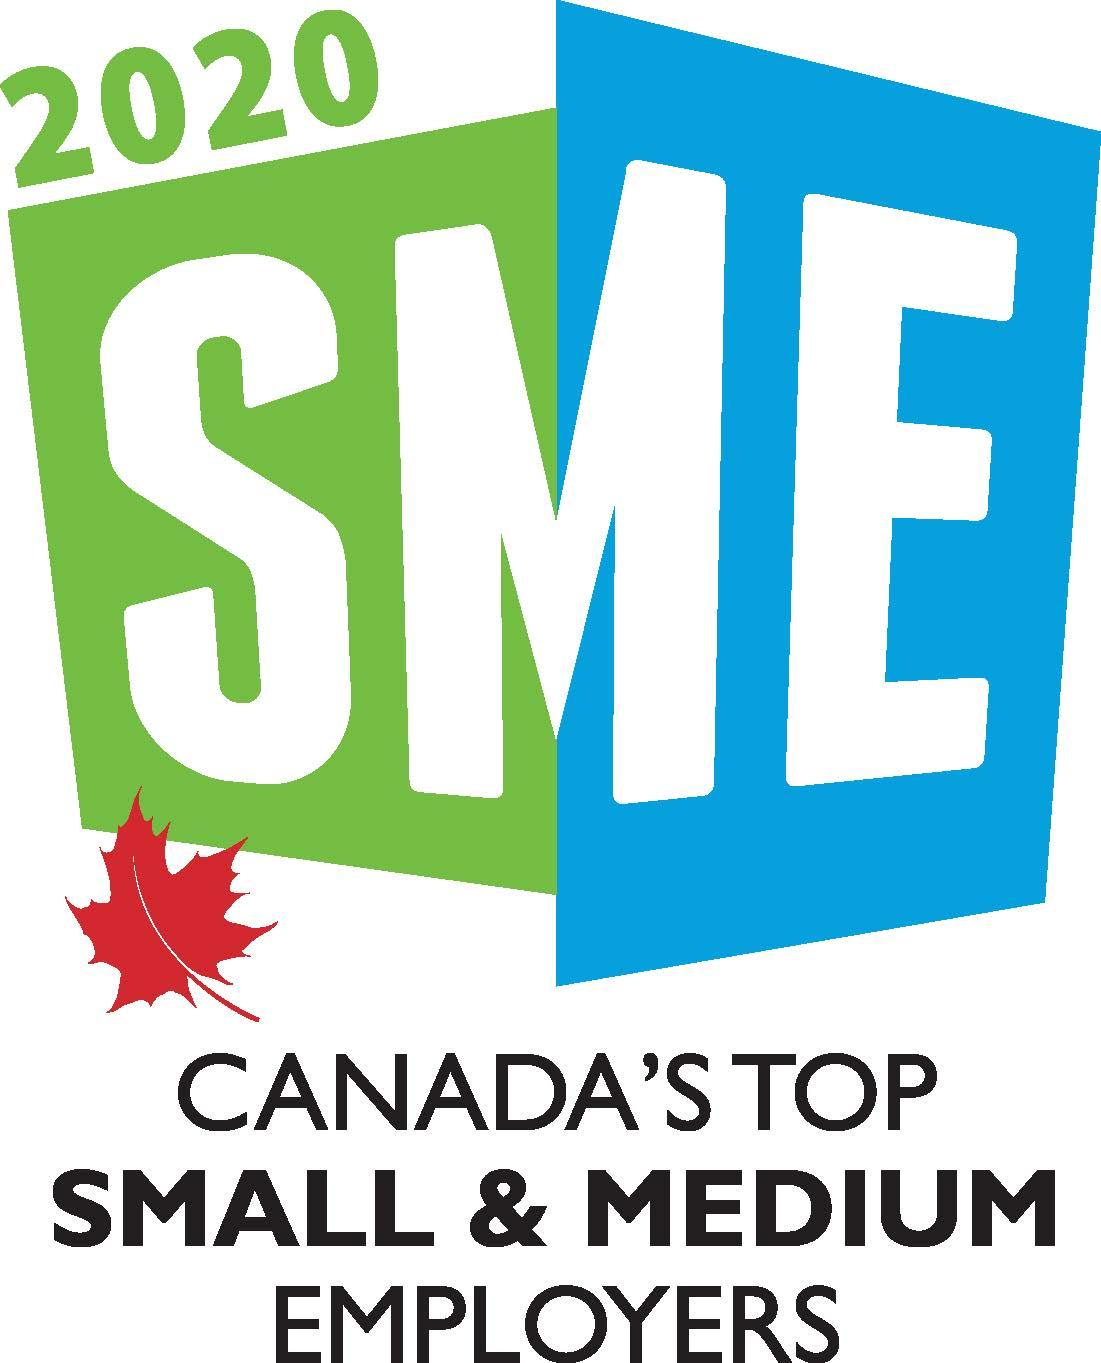 Canada's Top Small & Medium Employers (2020, 2019, 2018, 2017, 2016, 2015, 2014, 2013, 2012, 2011, 2010, 2009, 2008, 2007, 2006, 2005)